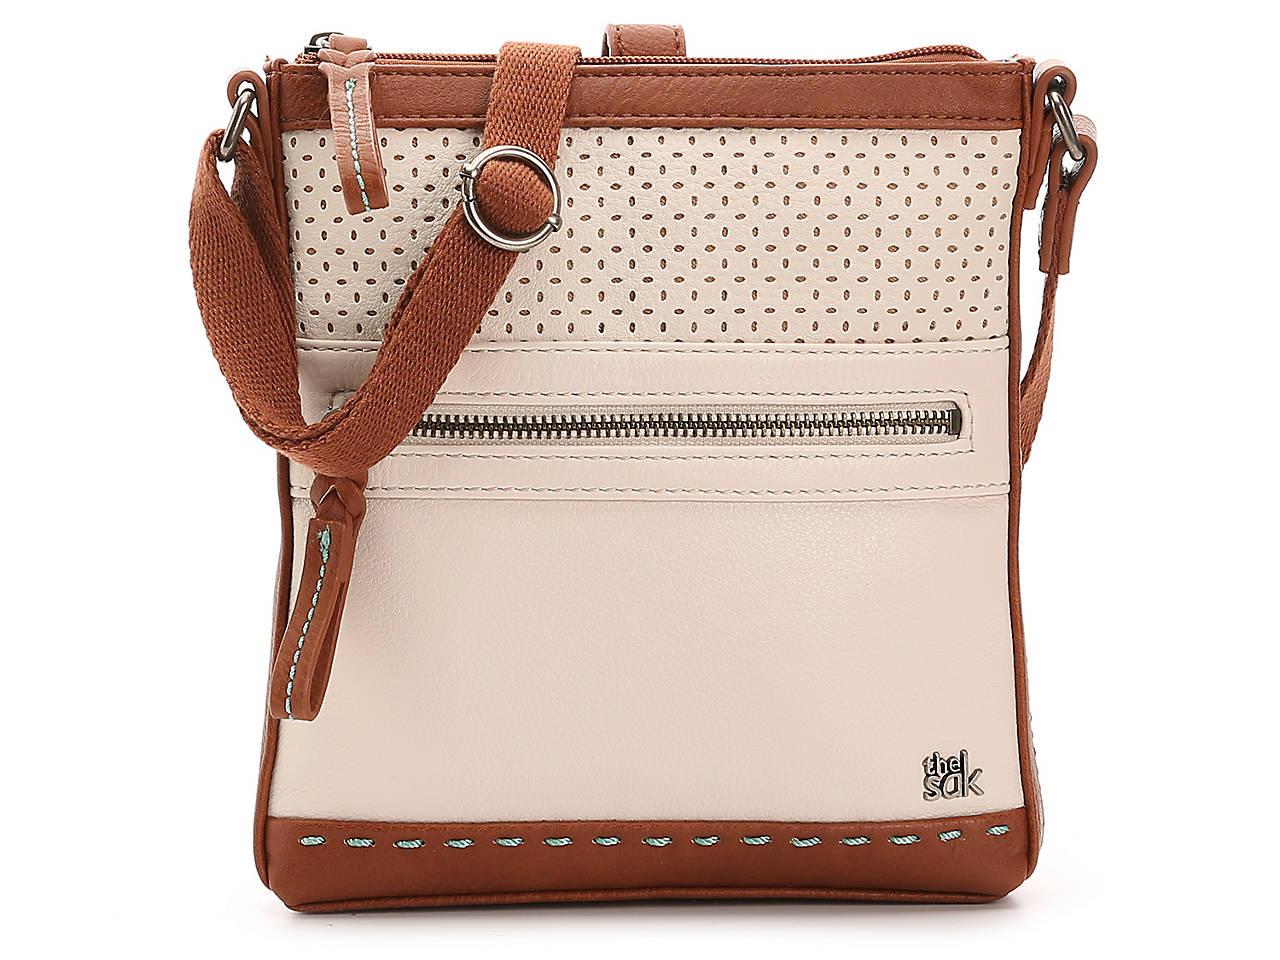 Pax Leather Crossbody Bag